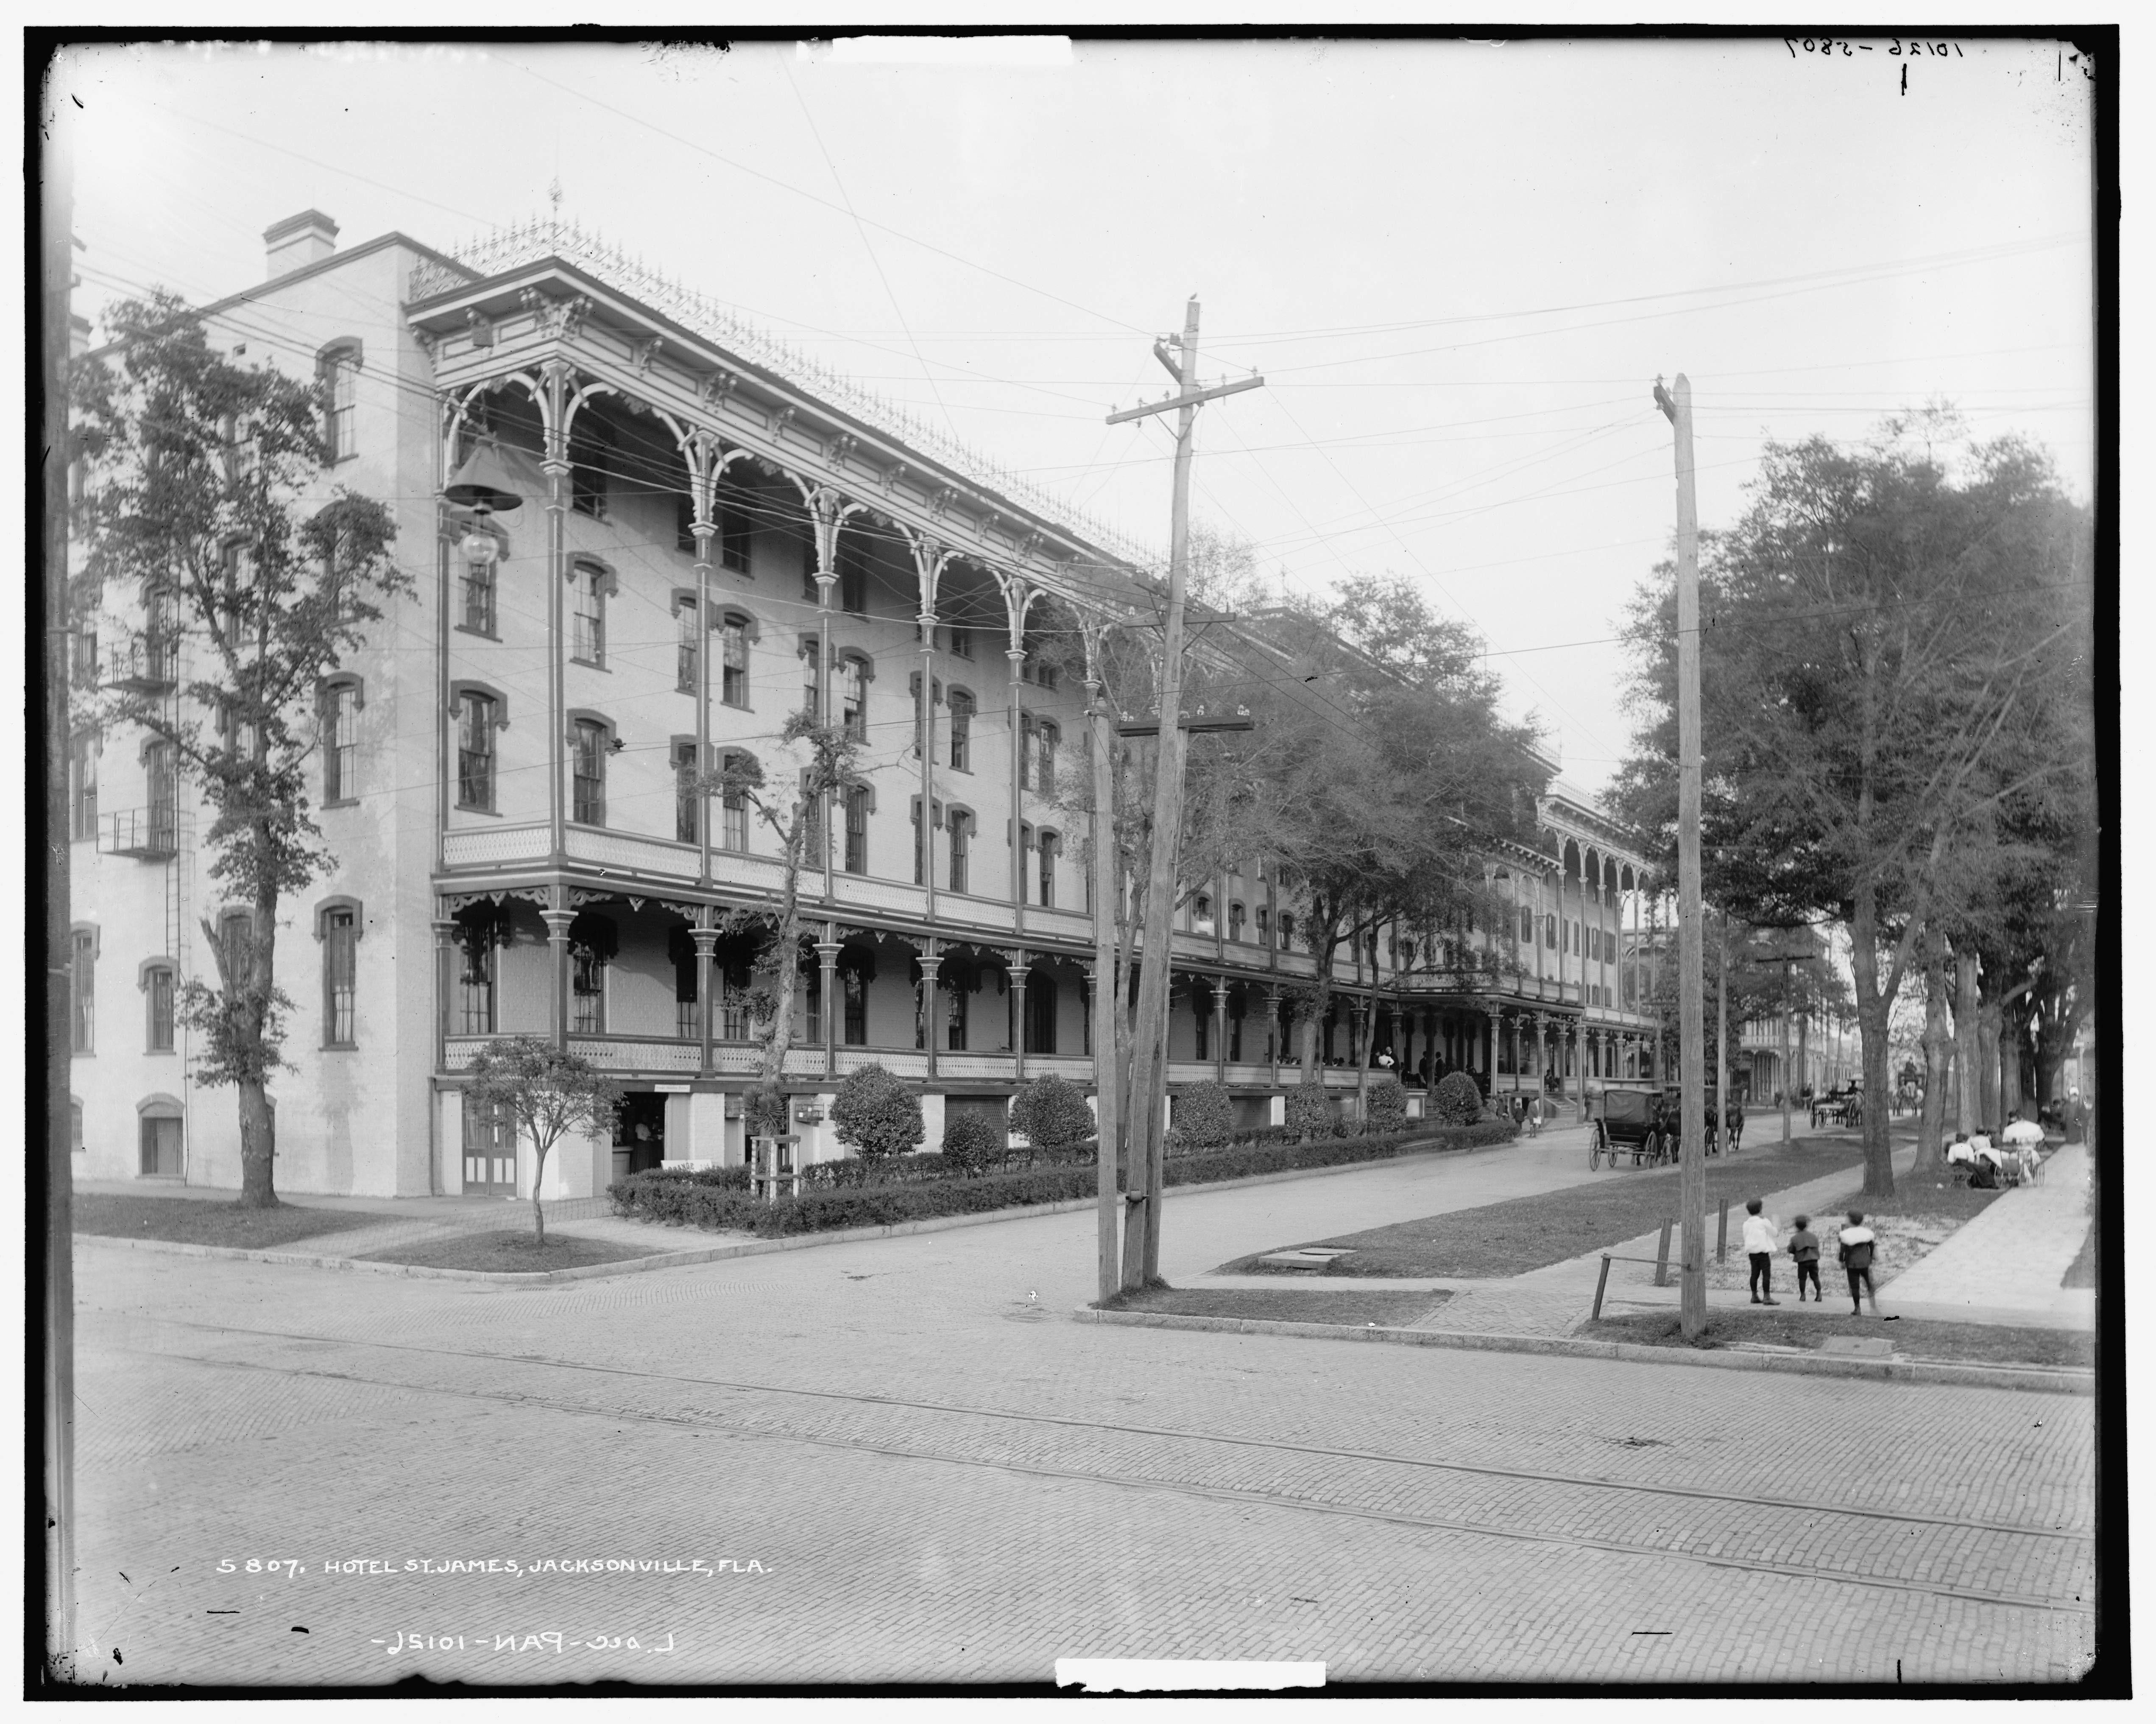 St James Hotel 1890s 117 W Duval St Jacksonville Fl Destroyed